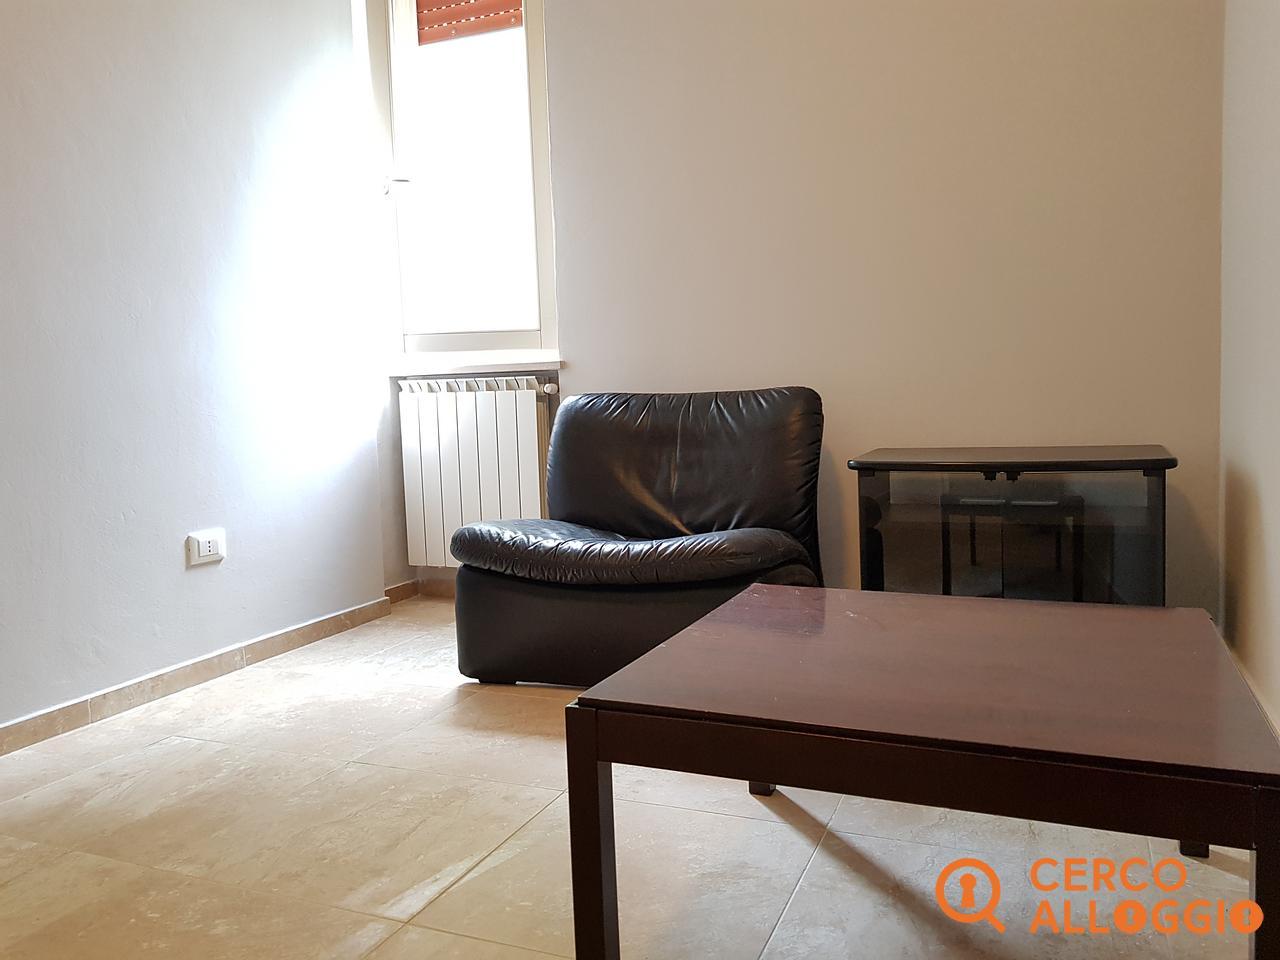 Copertina camera in affitto a Brescia